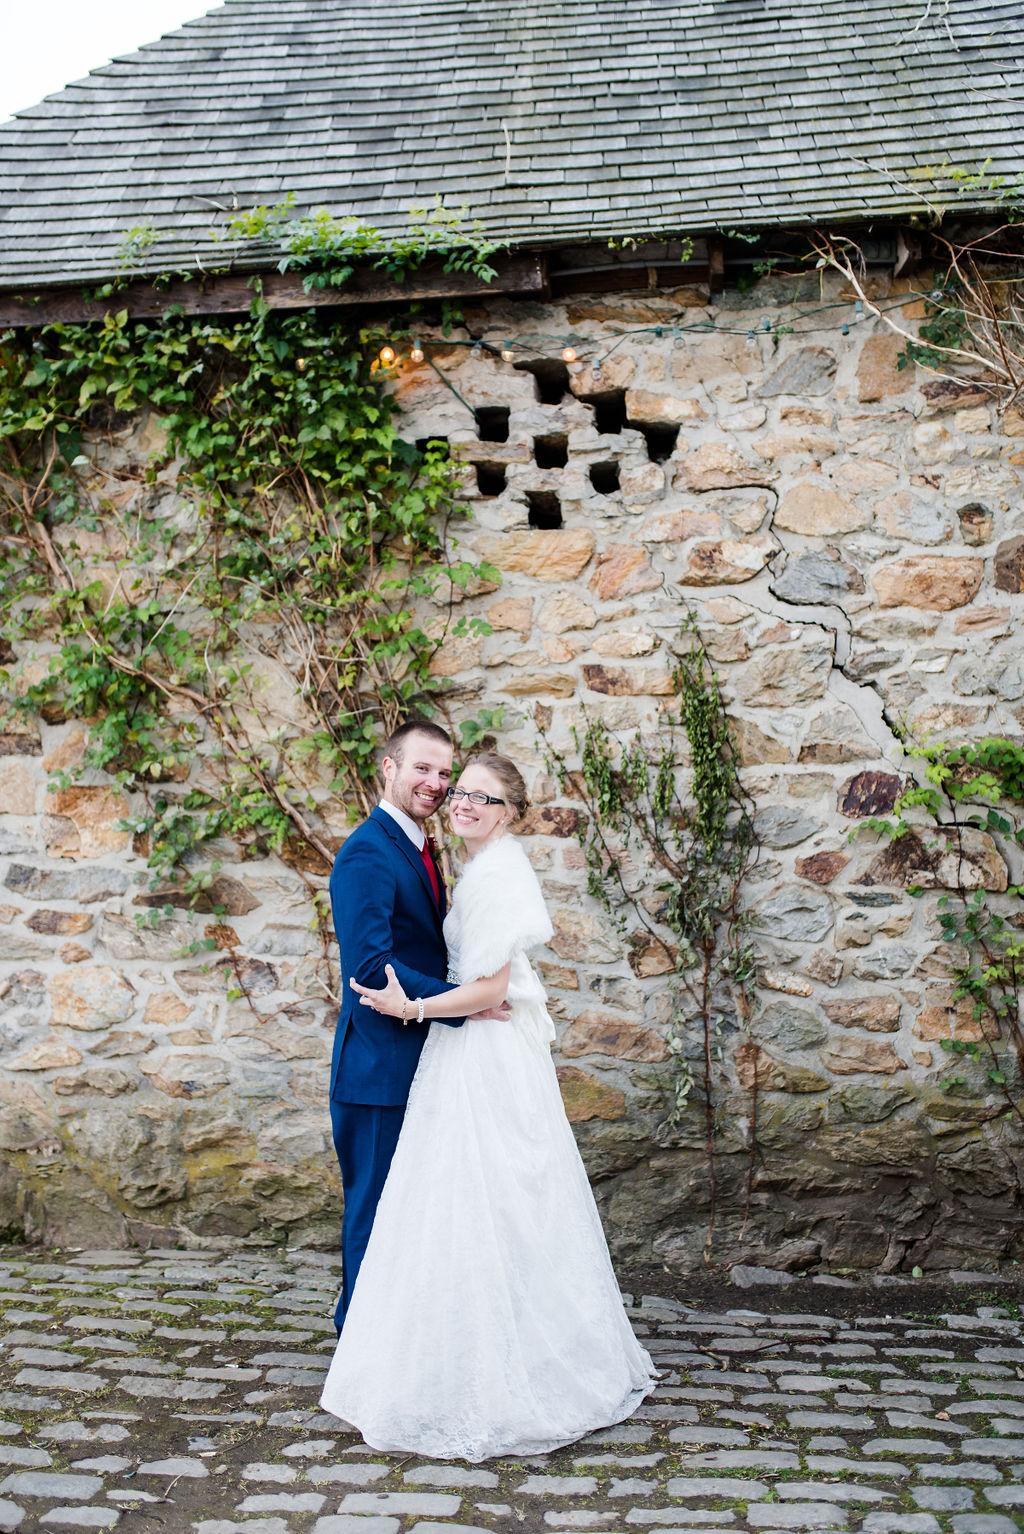 portraits-lauxmont-farms-fall-wedding-an